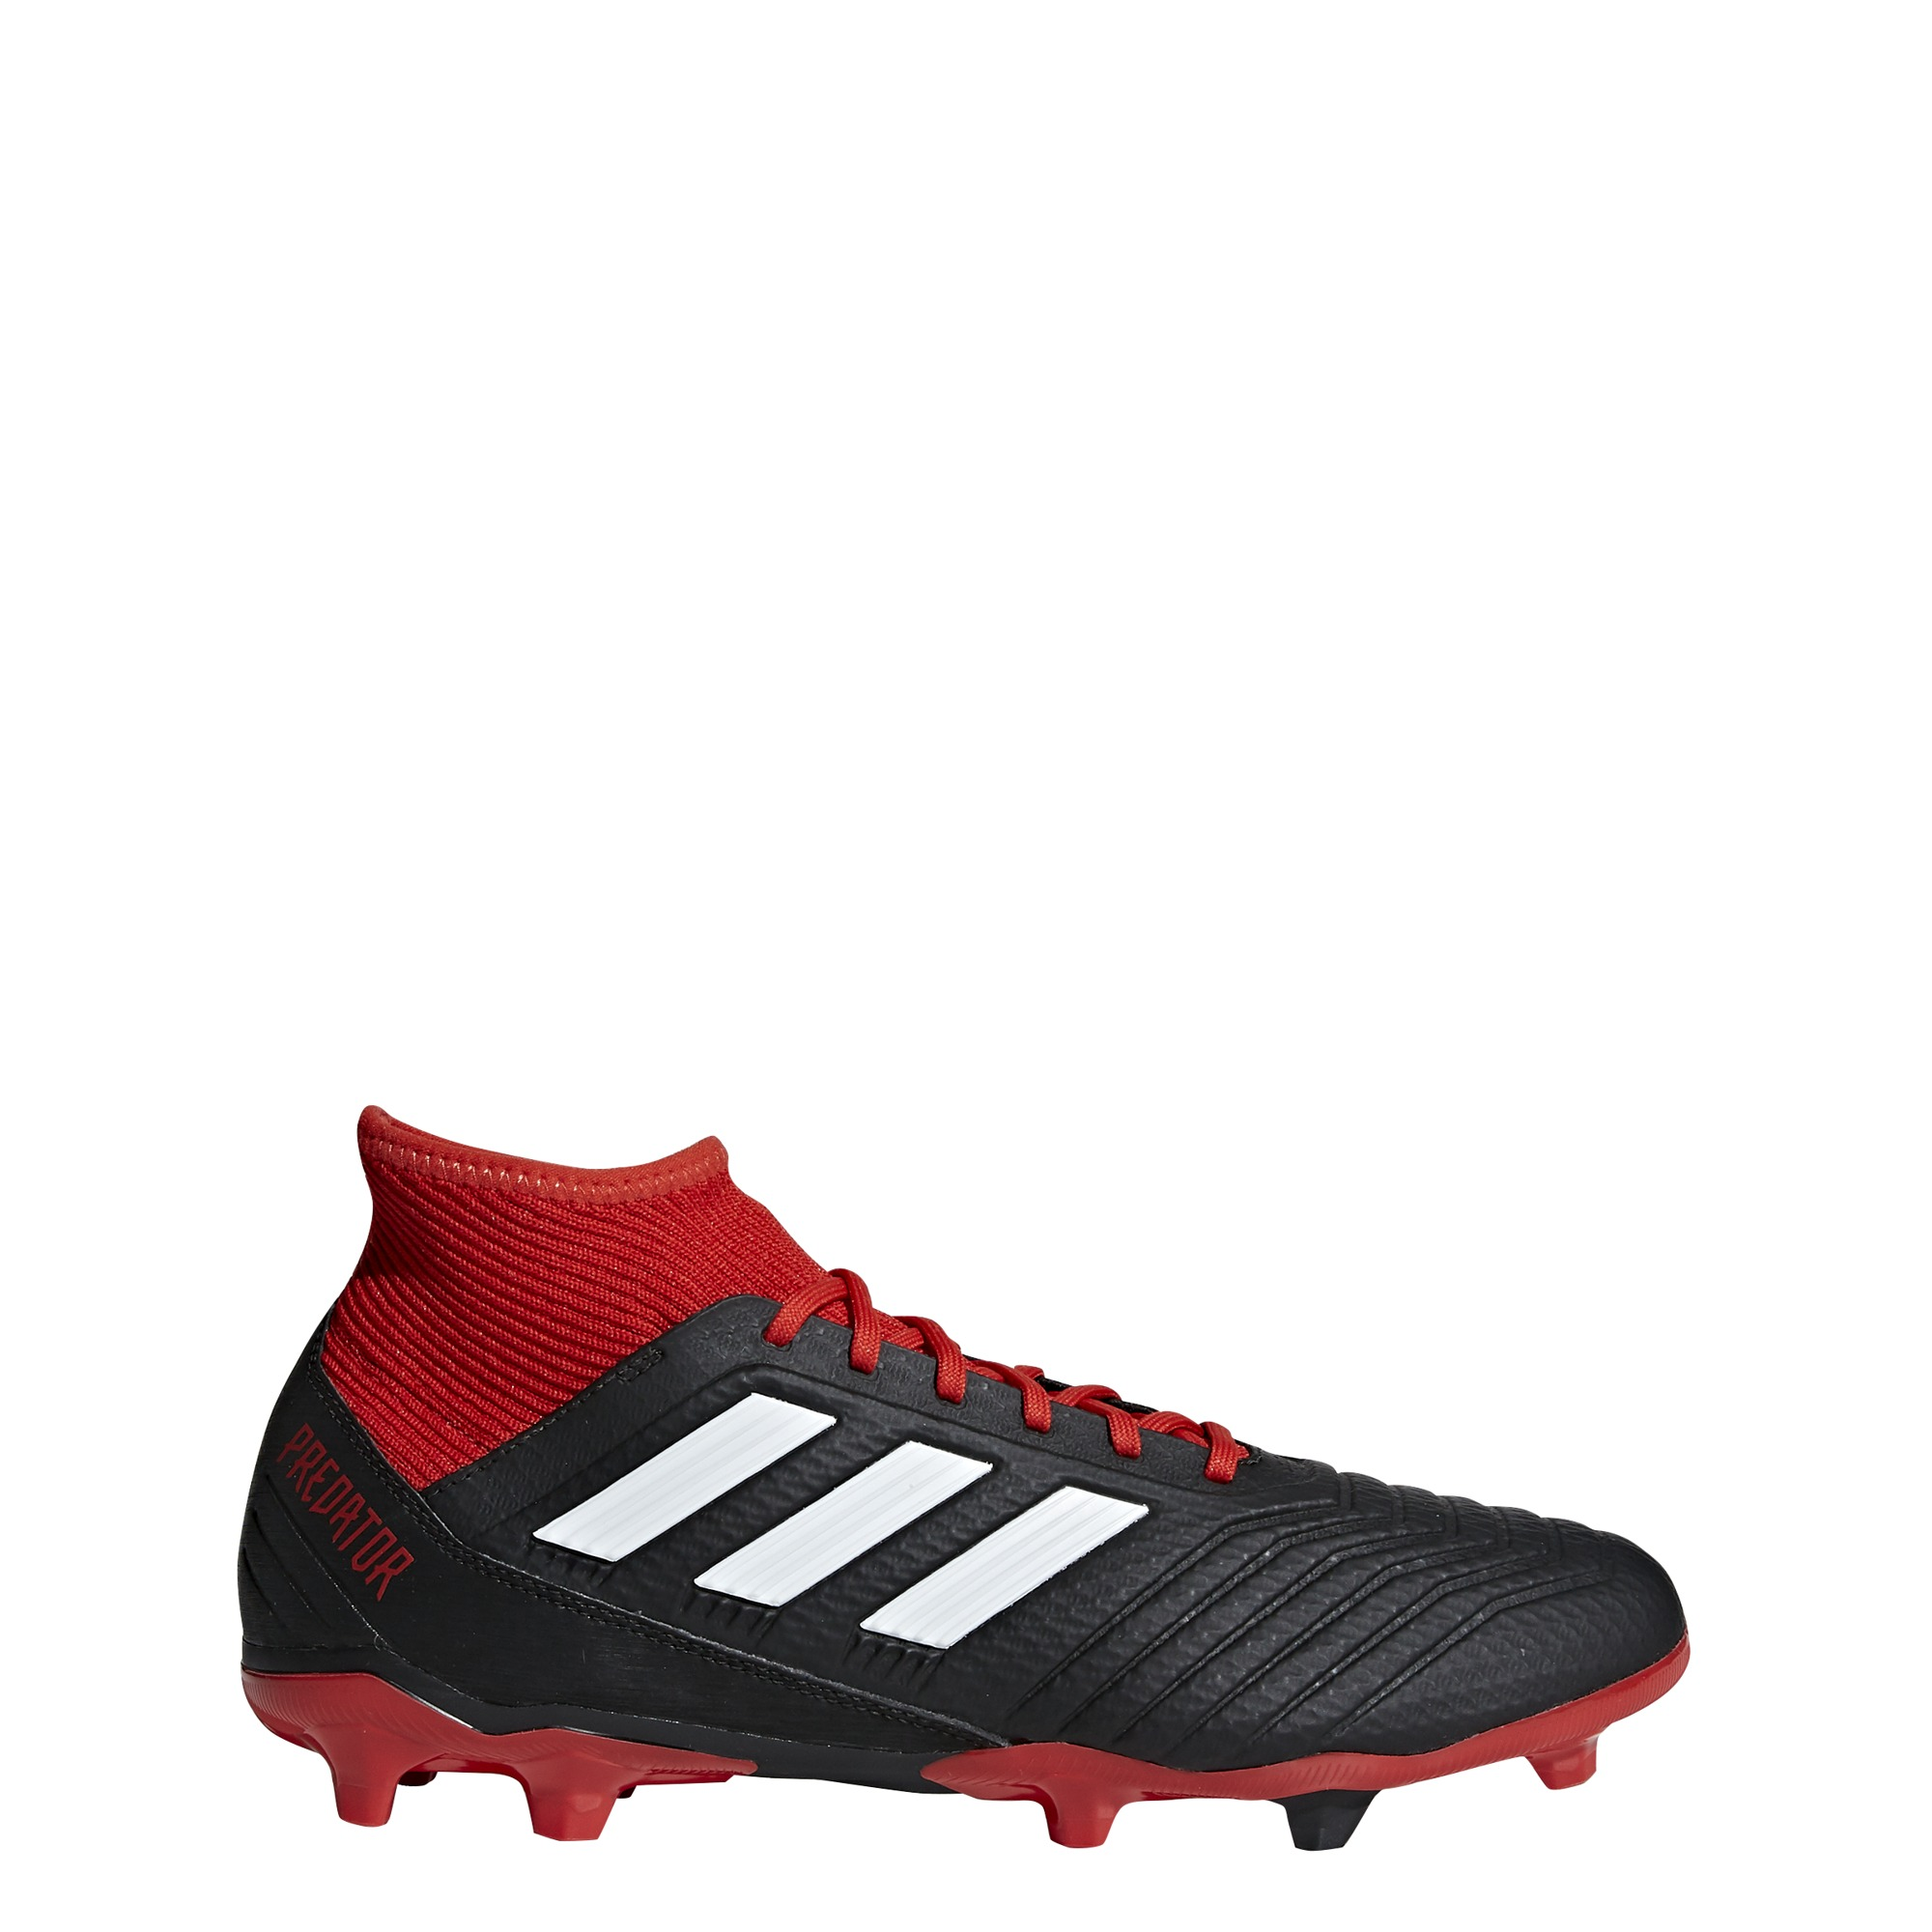 c56508556b0c Soccer Solution Store | Adidas PREDATOR 18.3 FG Boots